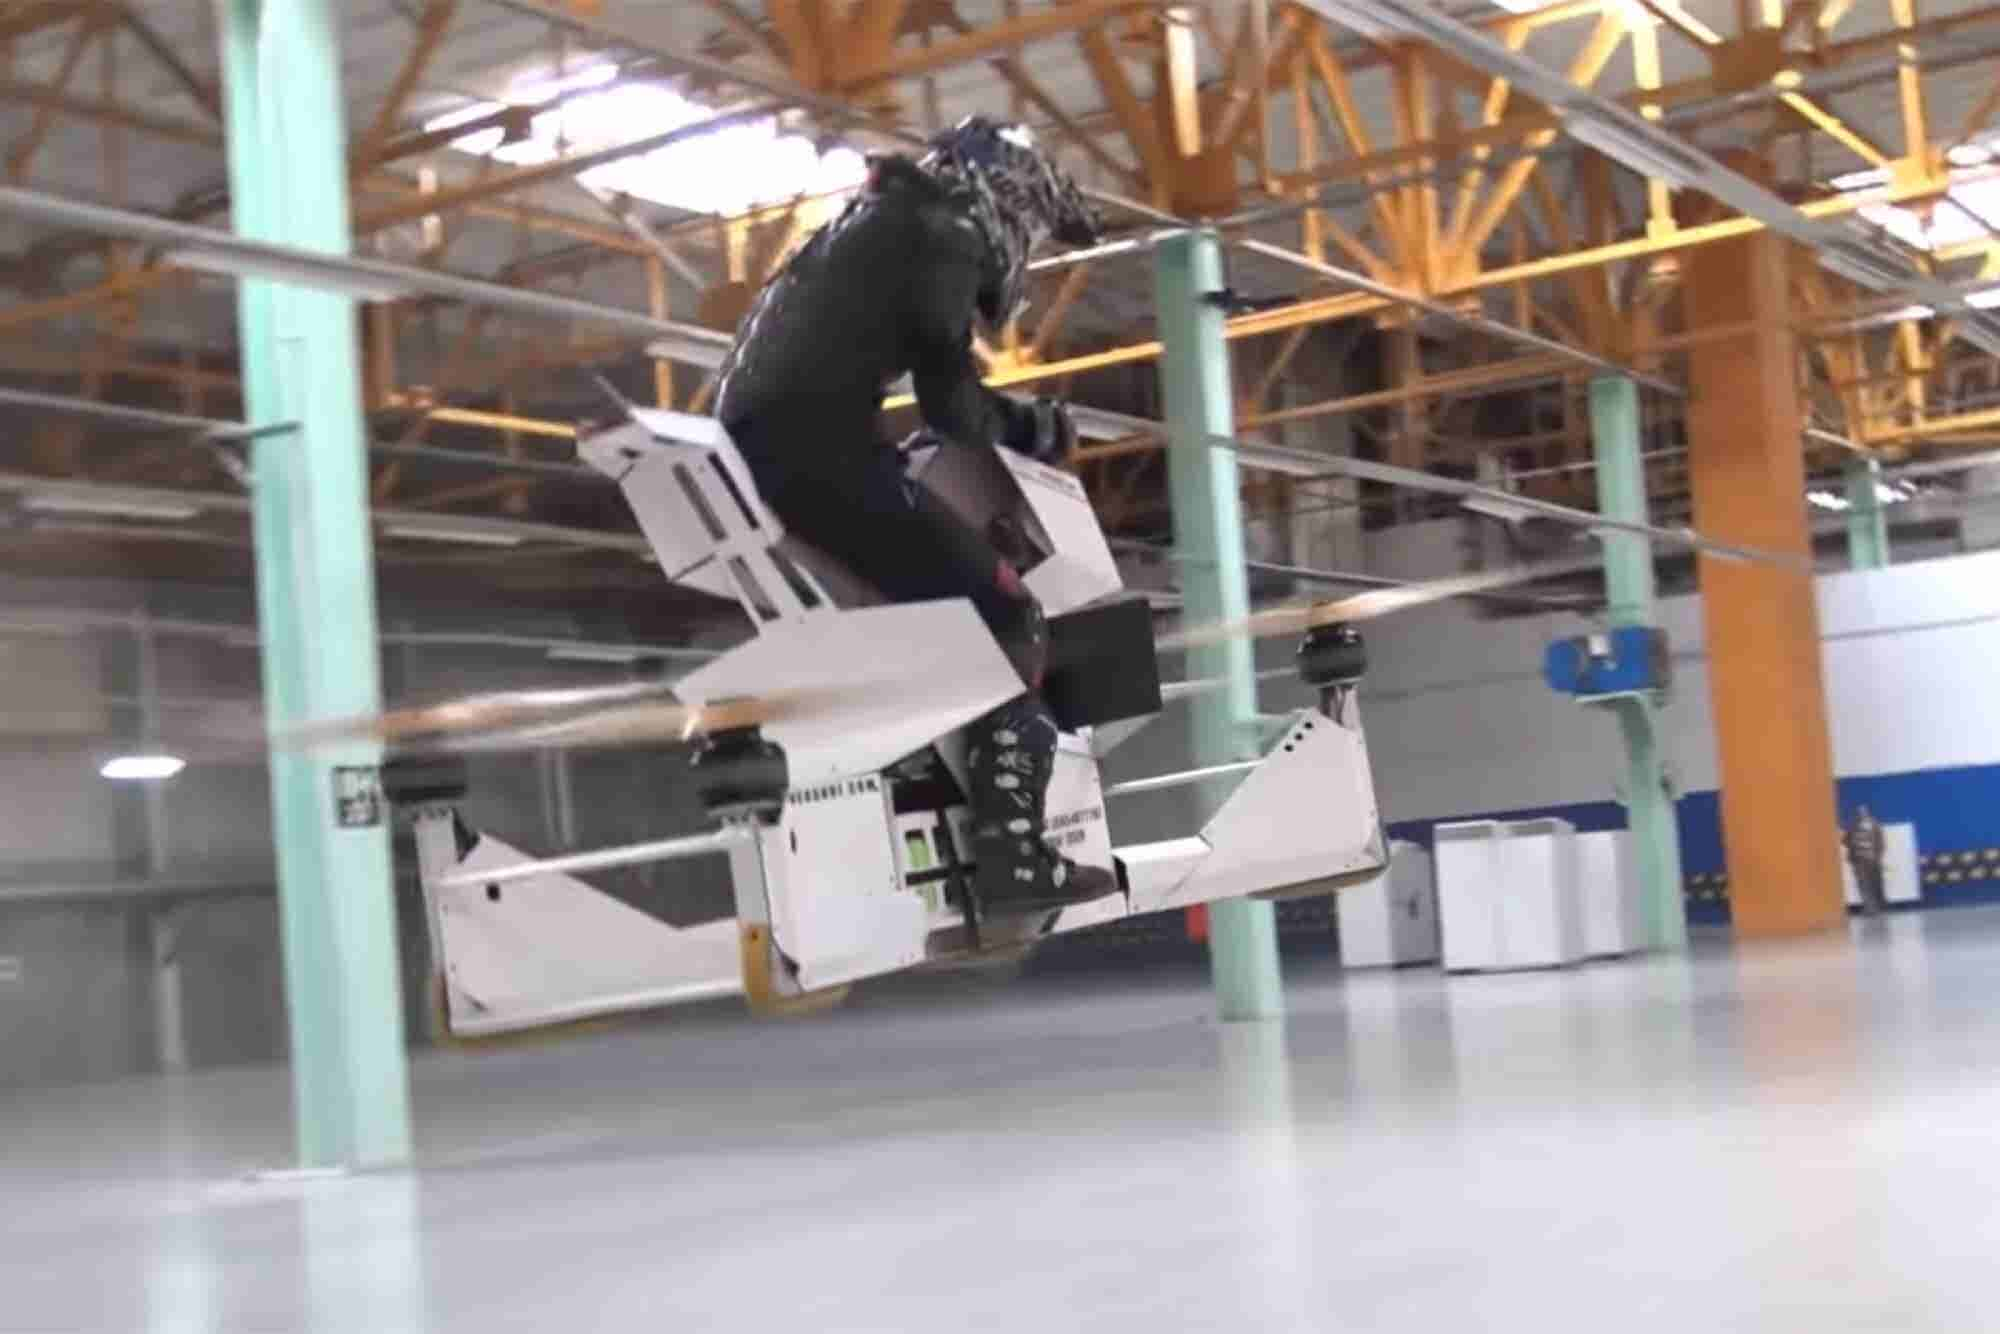 Así se opera una moto voladora